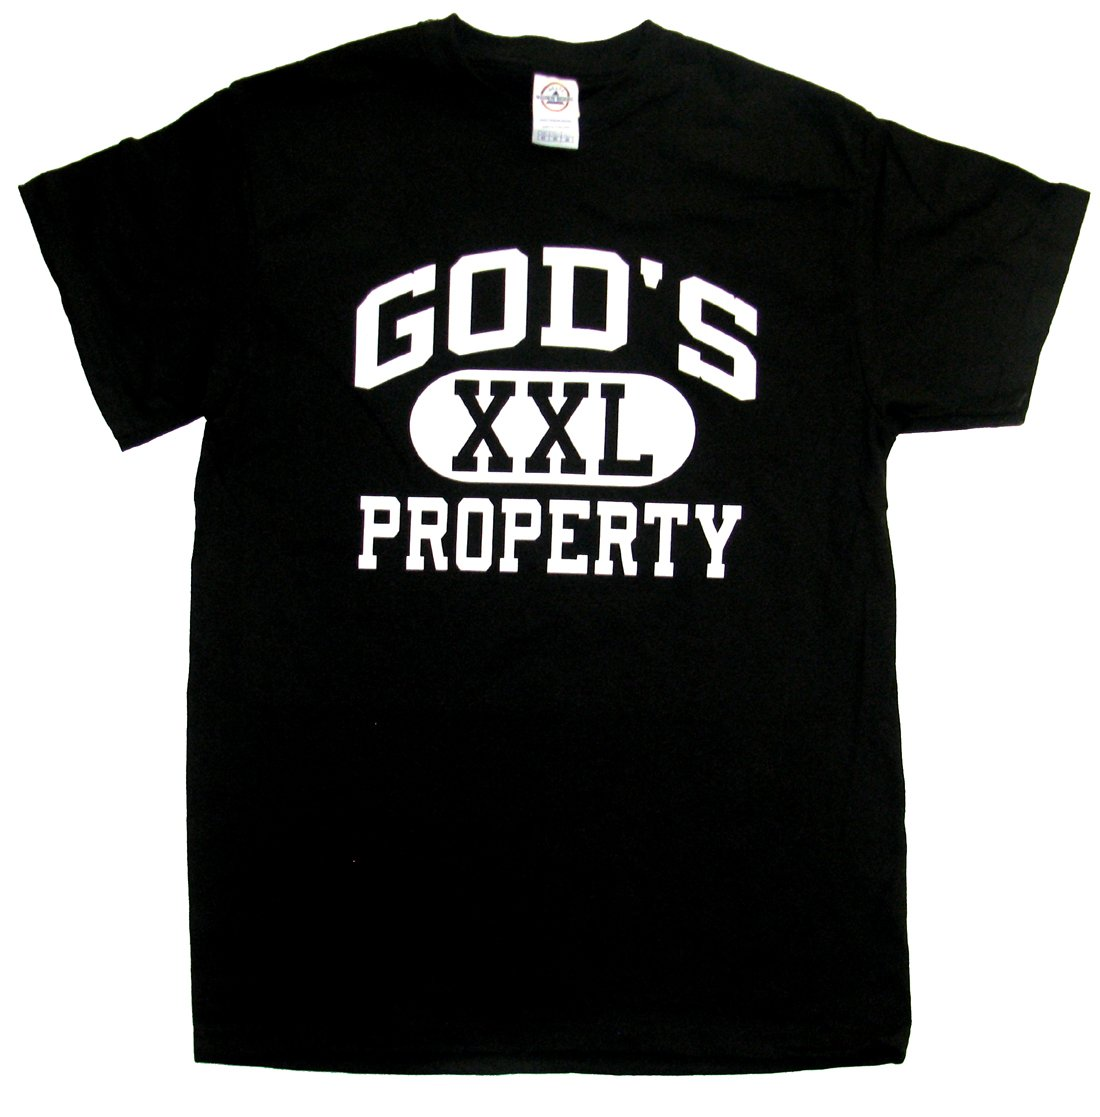 Gods Property Tshirt Christian Tee Athlectic